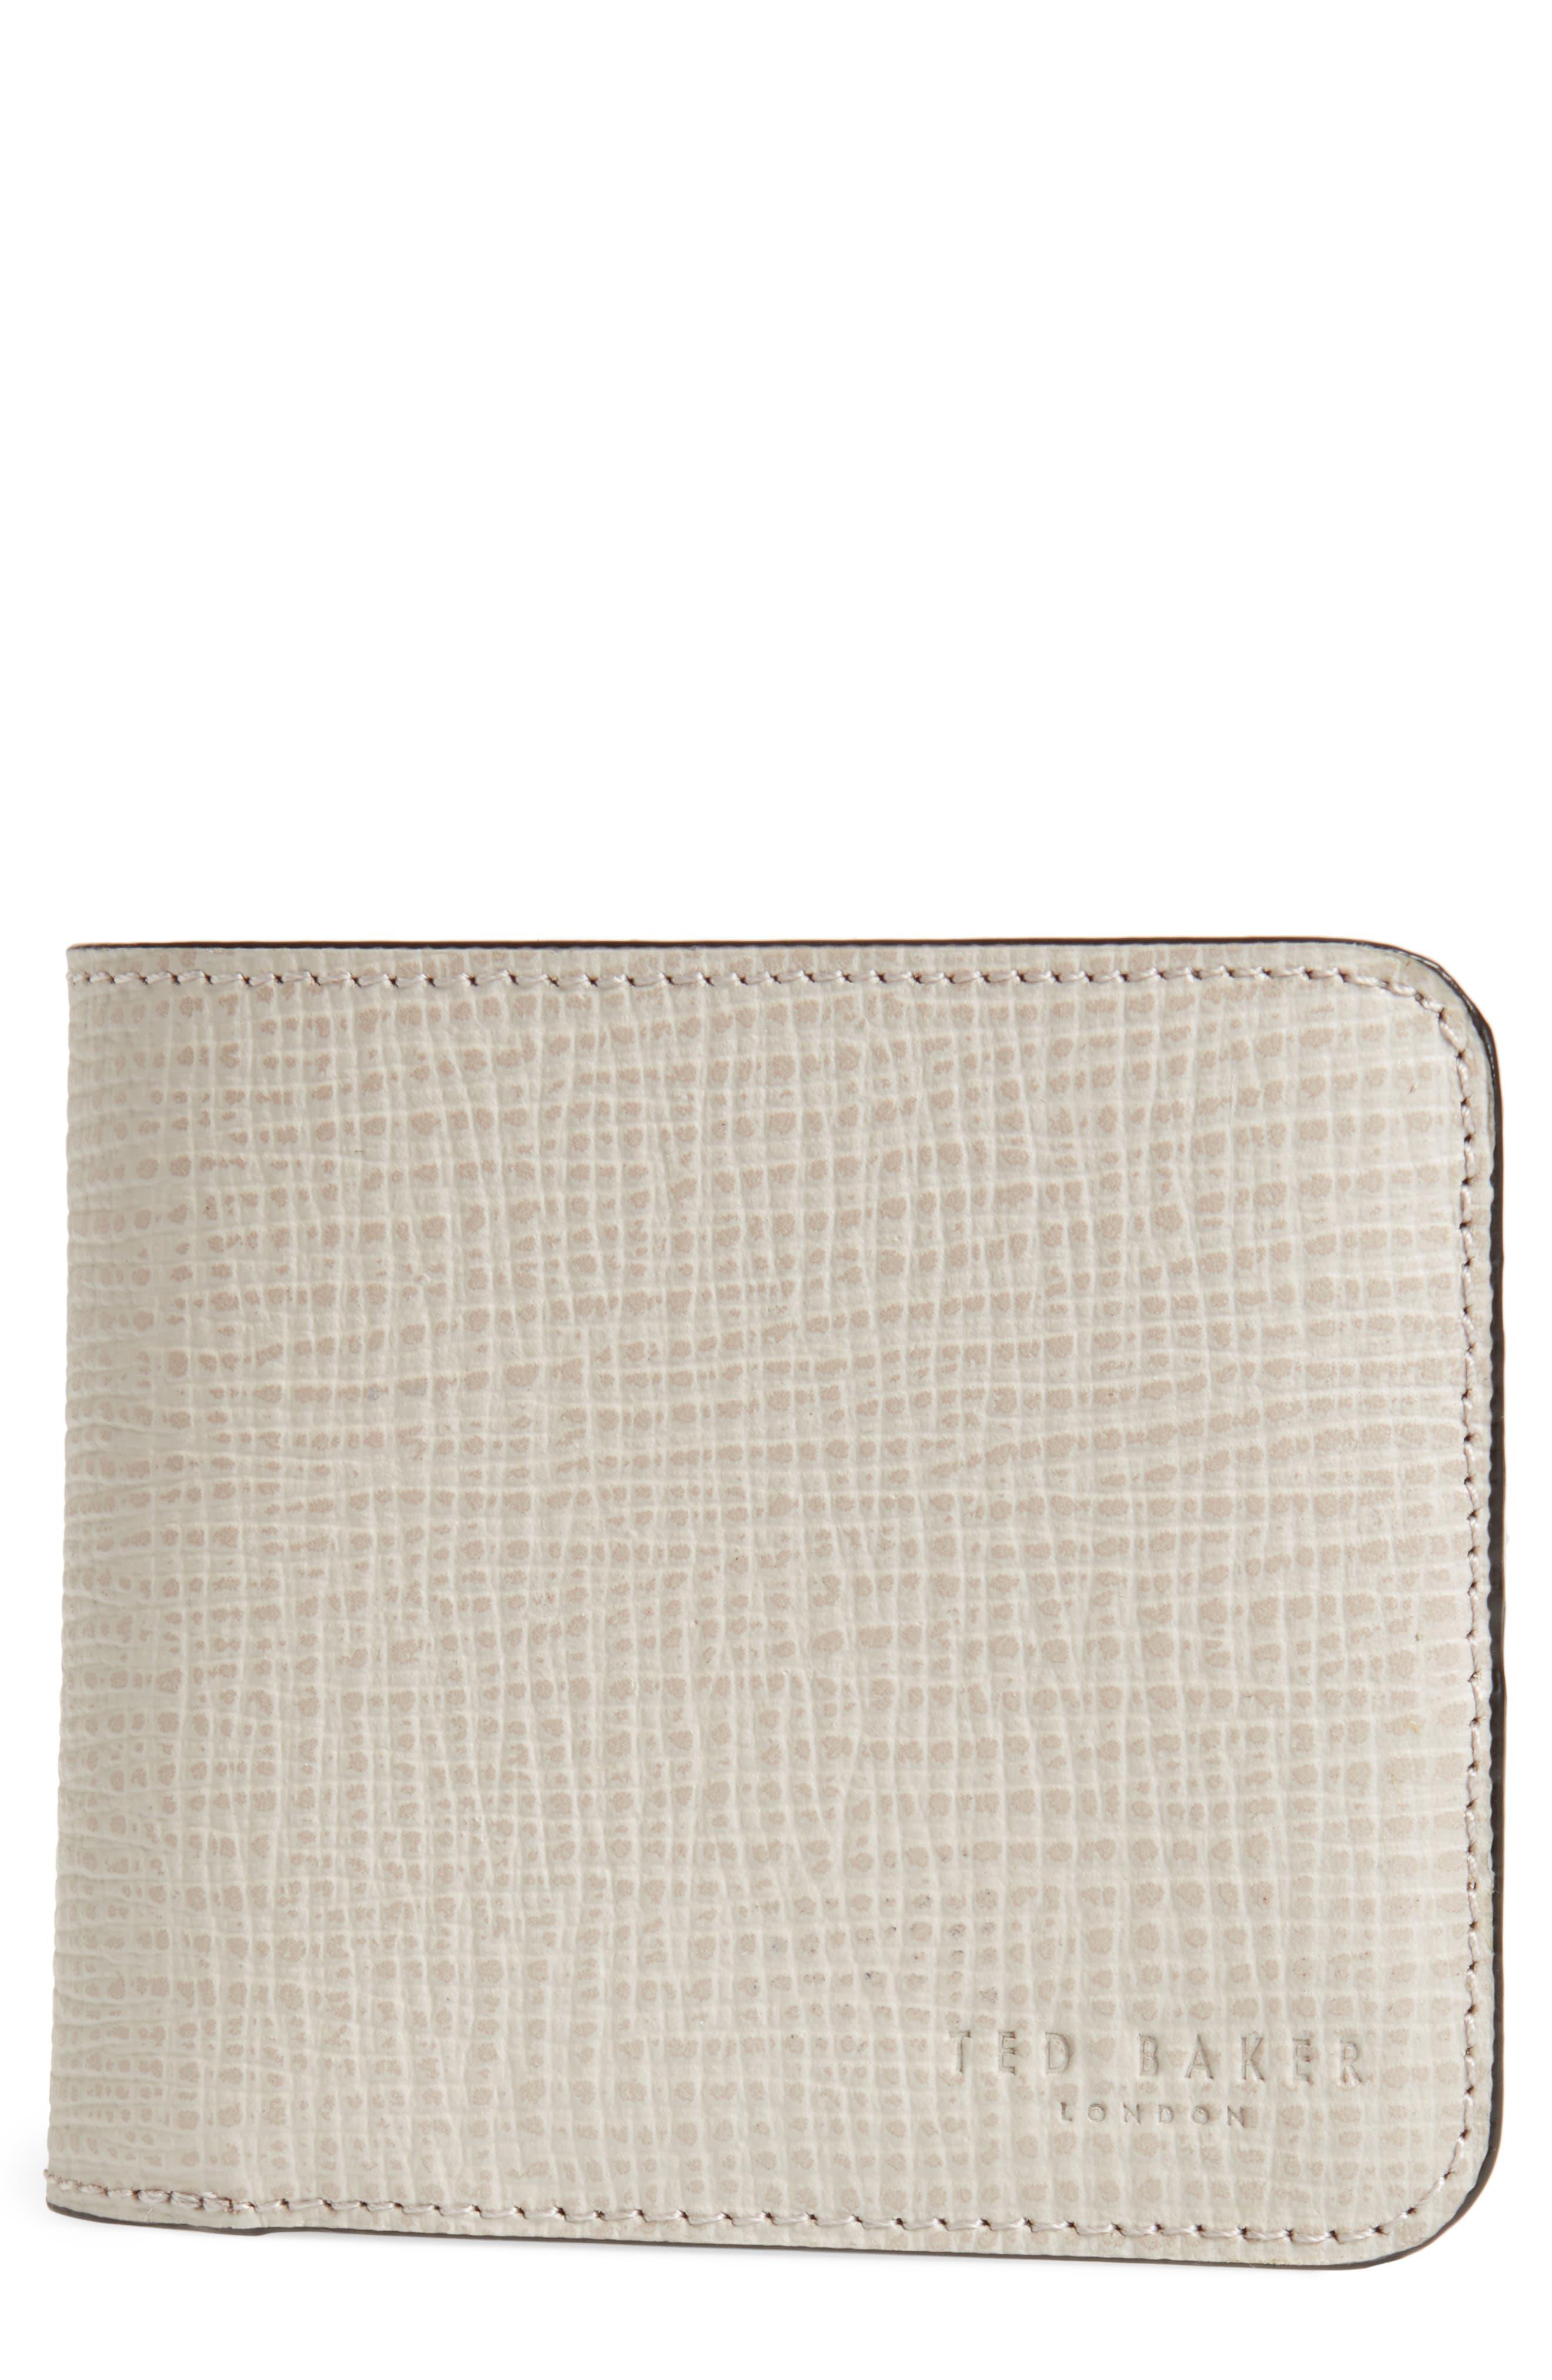 Astridd Palmelato Leather Wallet,                             Main thumbnail 1, color,                             200